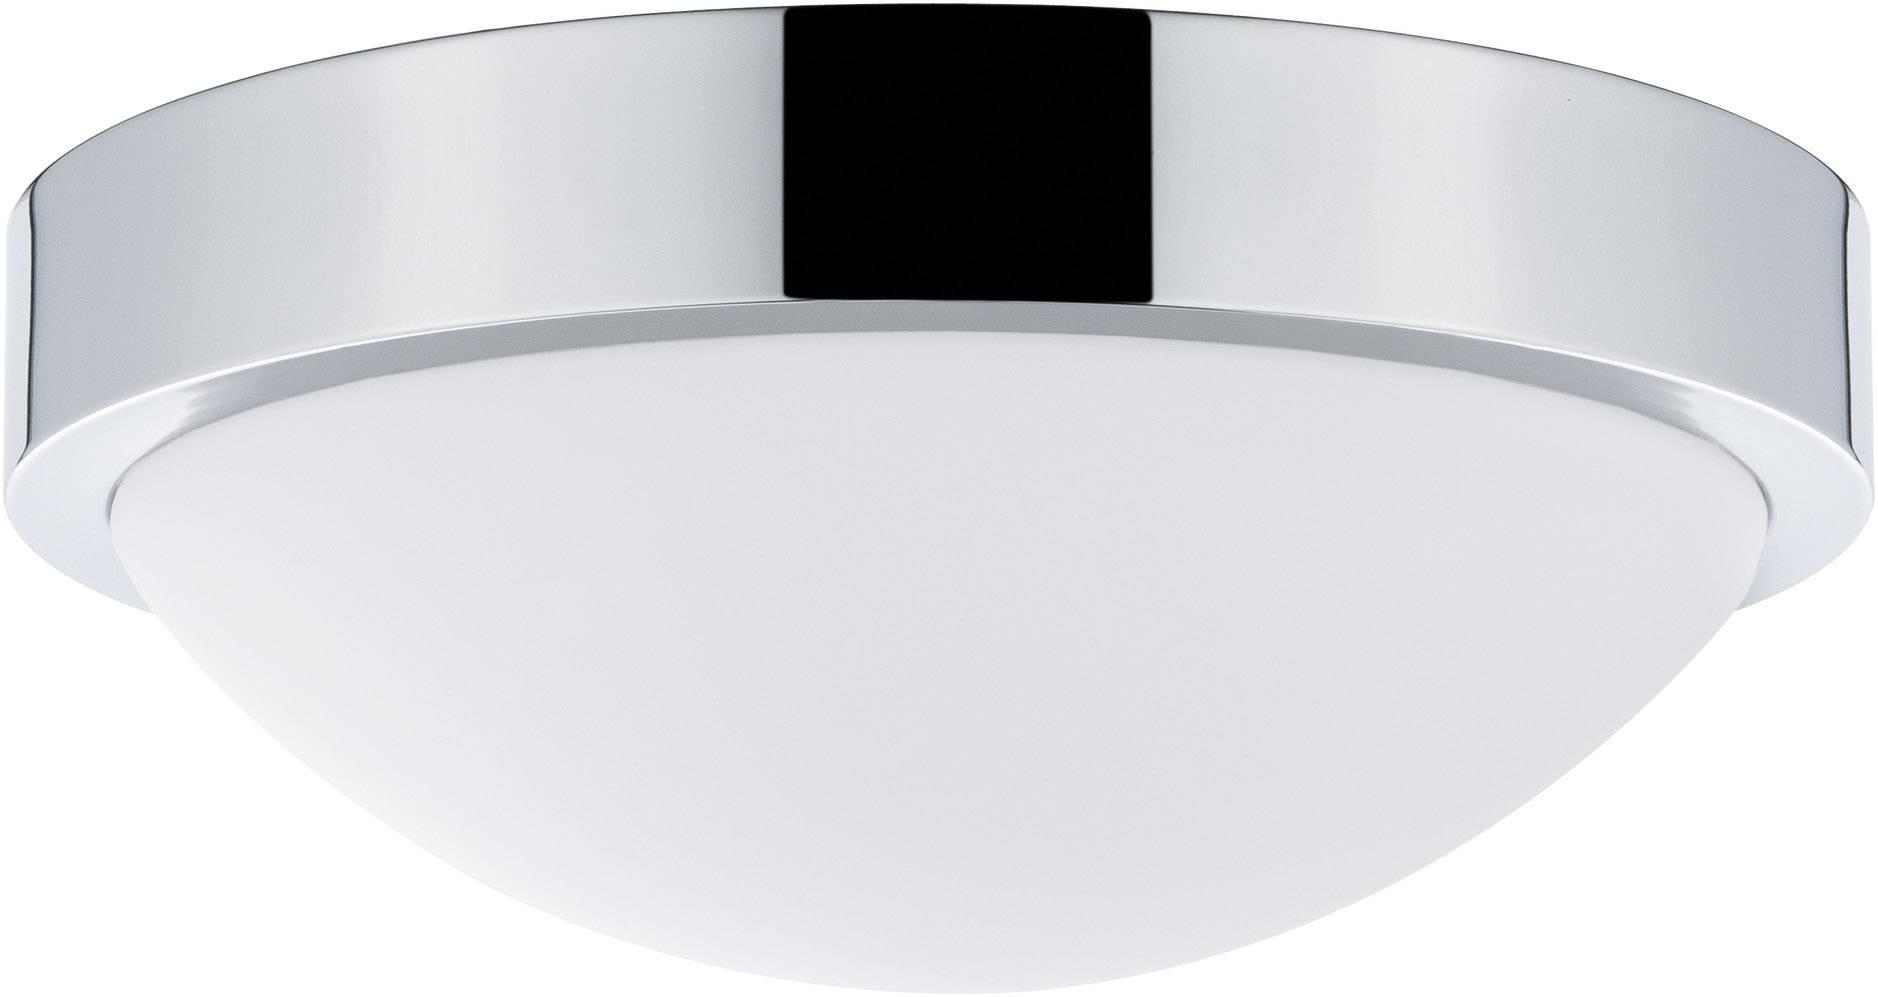 Badkamer plafondlamp LED E27 18 W Paulmann Falima 70806 Chroom, Wit ...